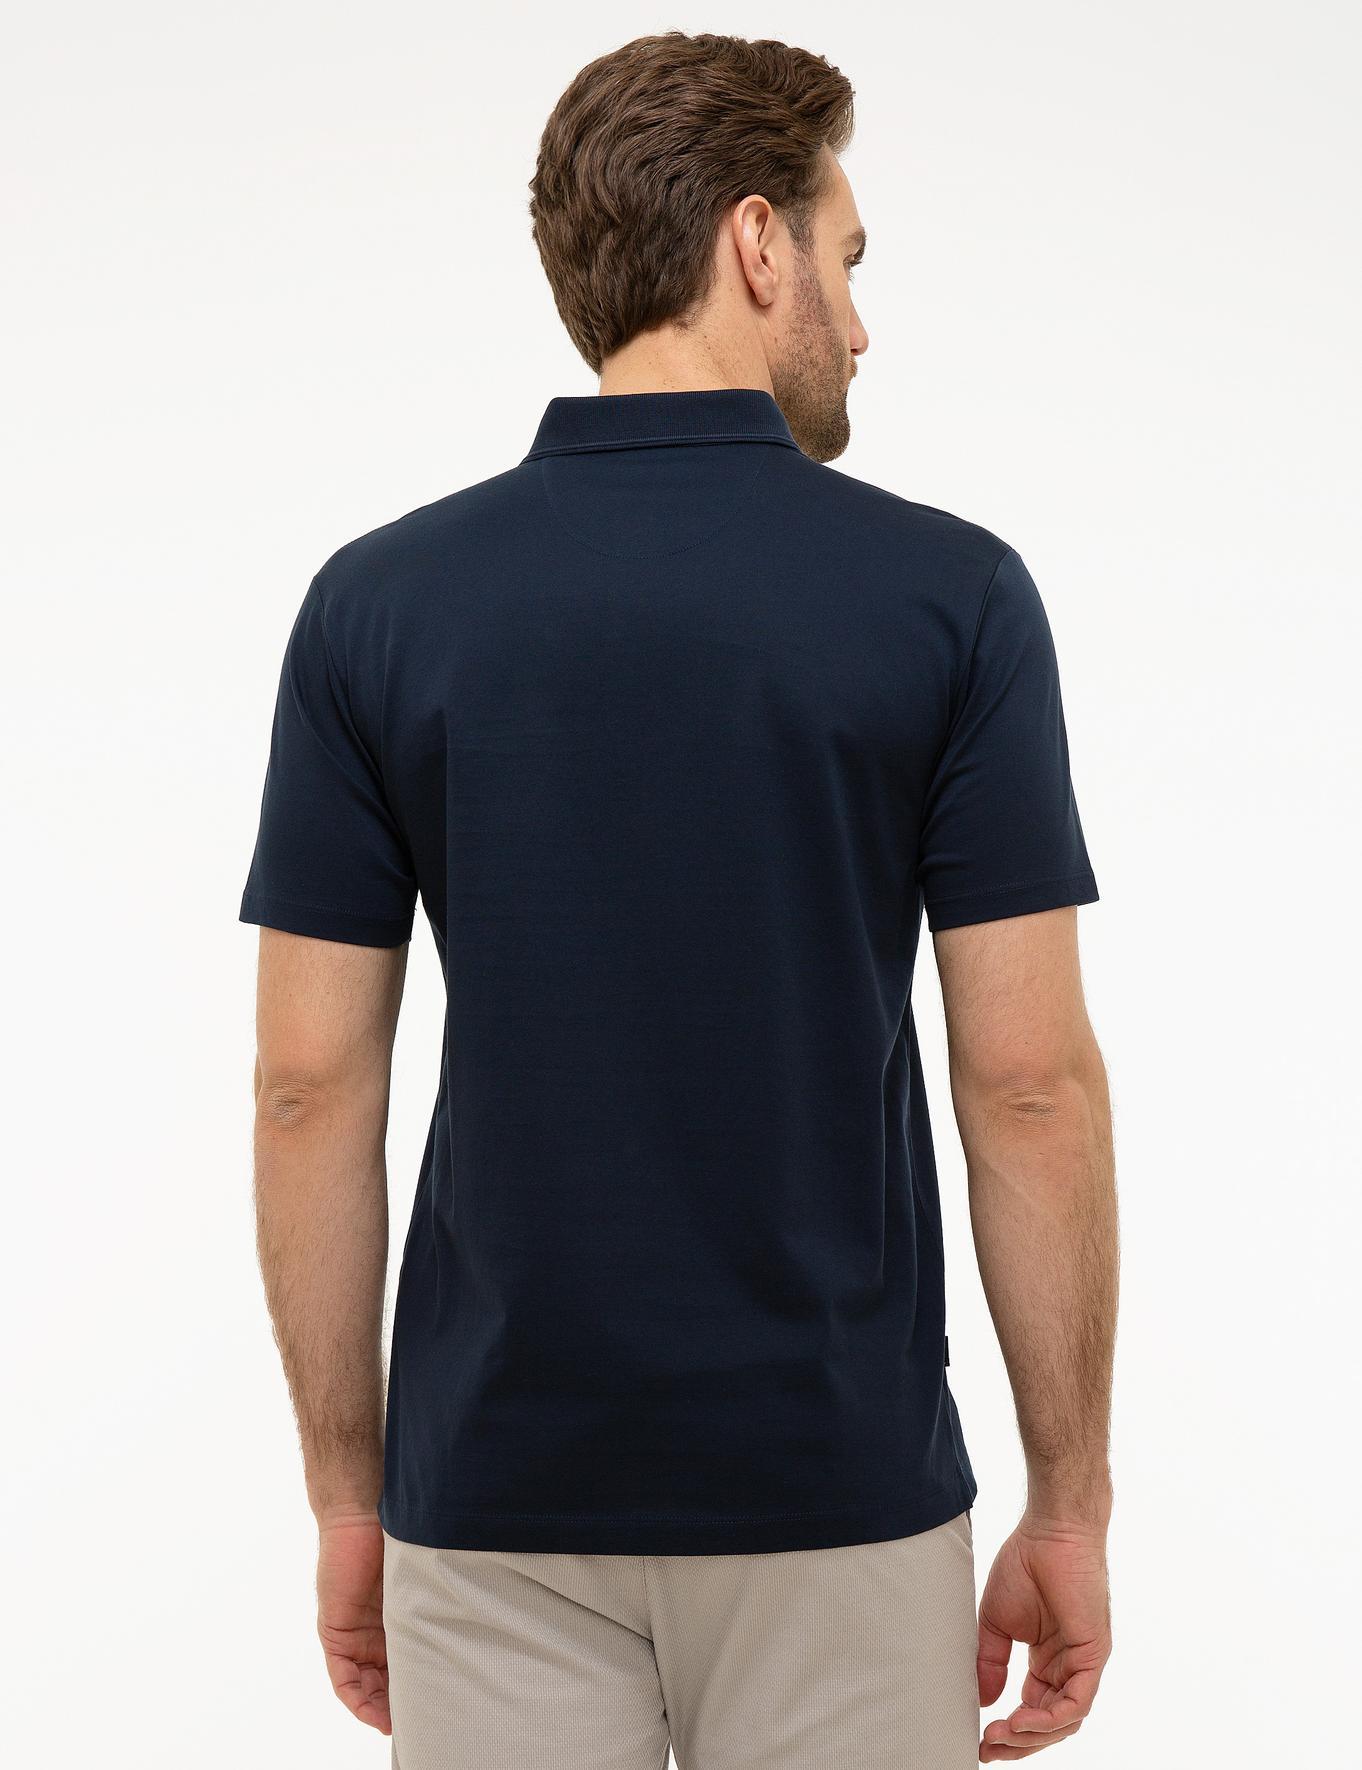 Koyu Lacivert Regular Fit T-Shirt